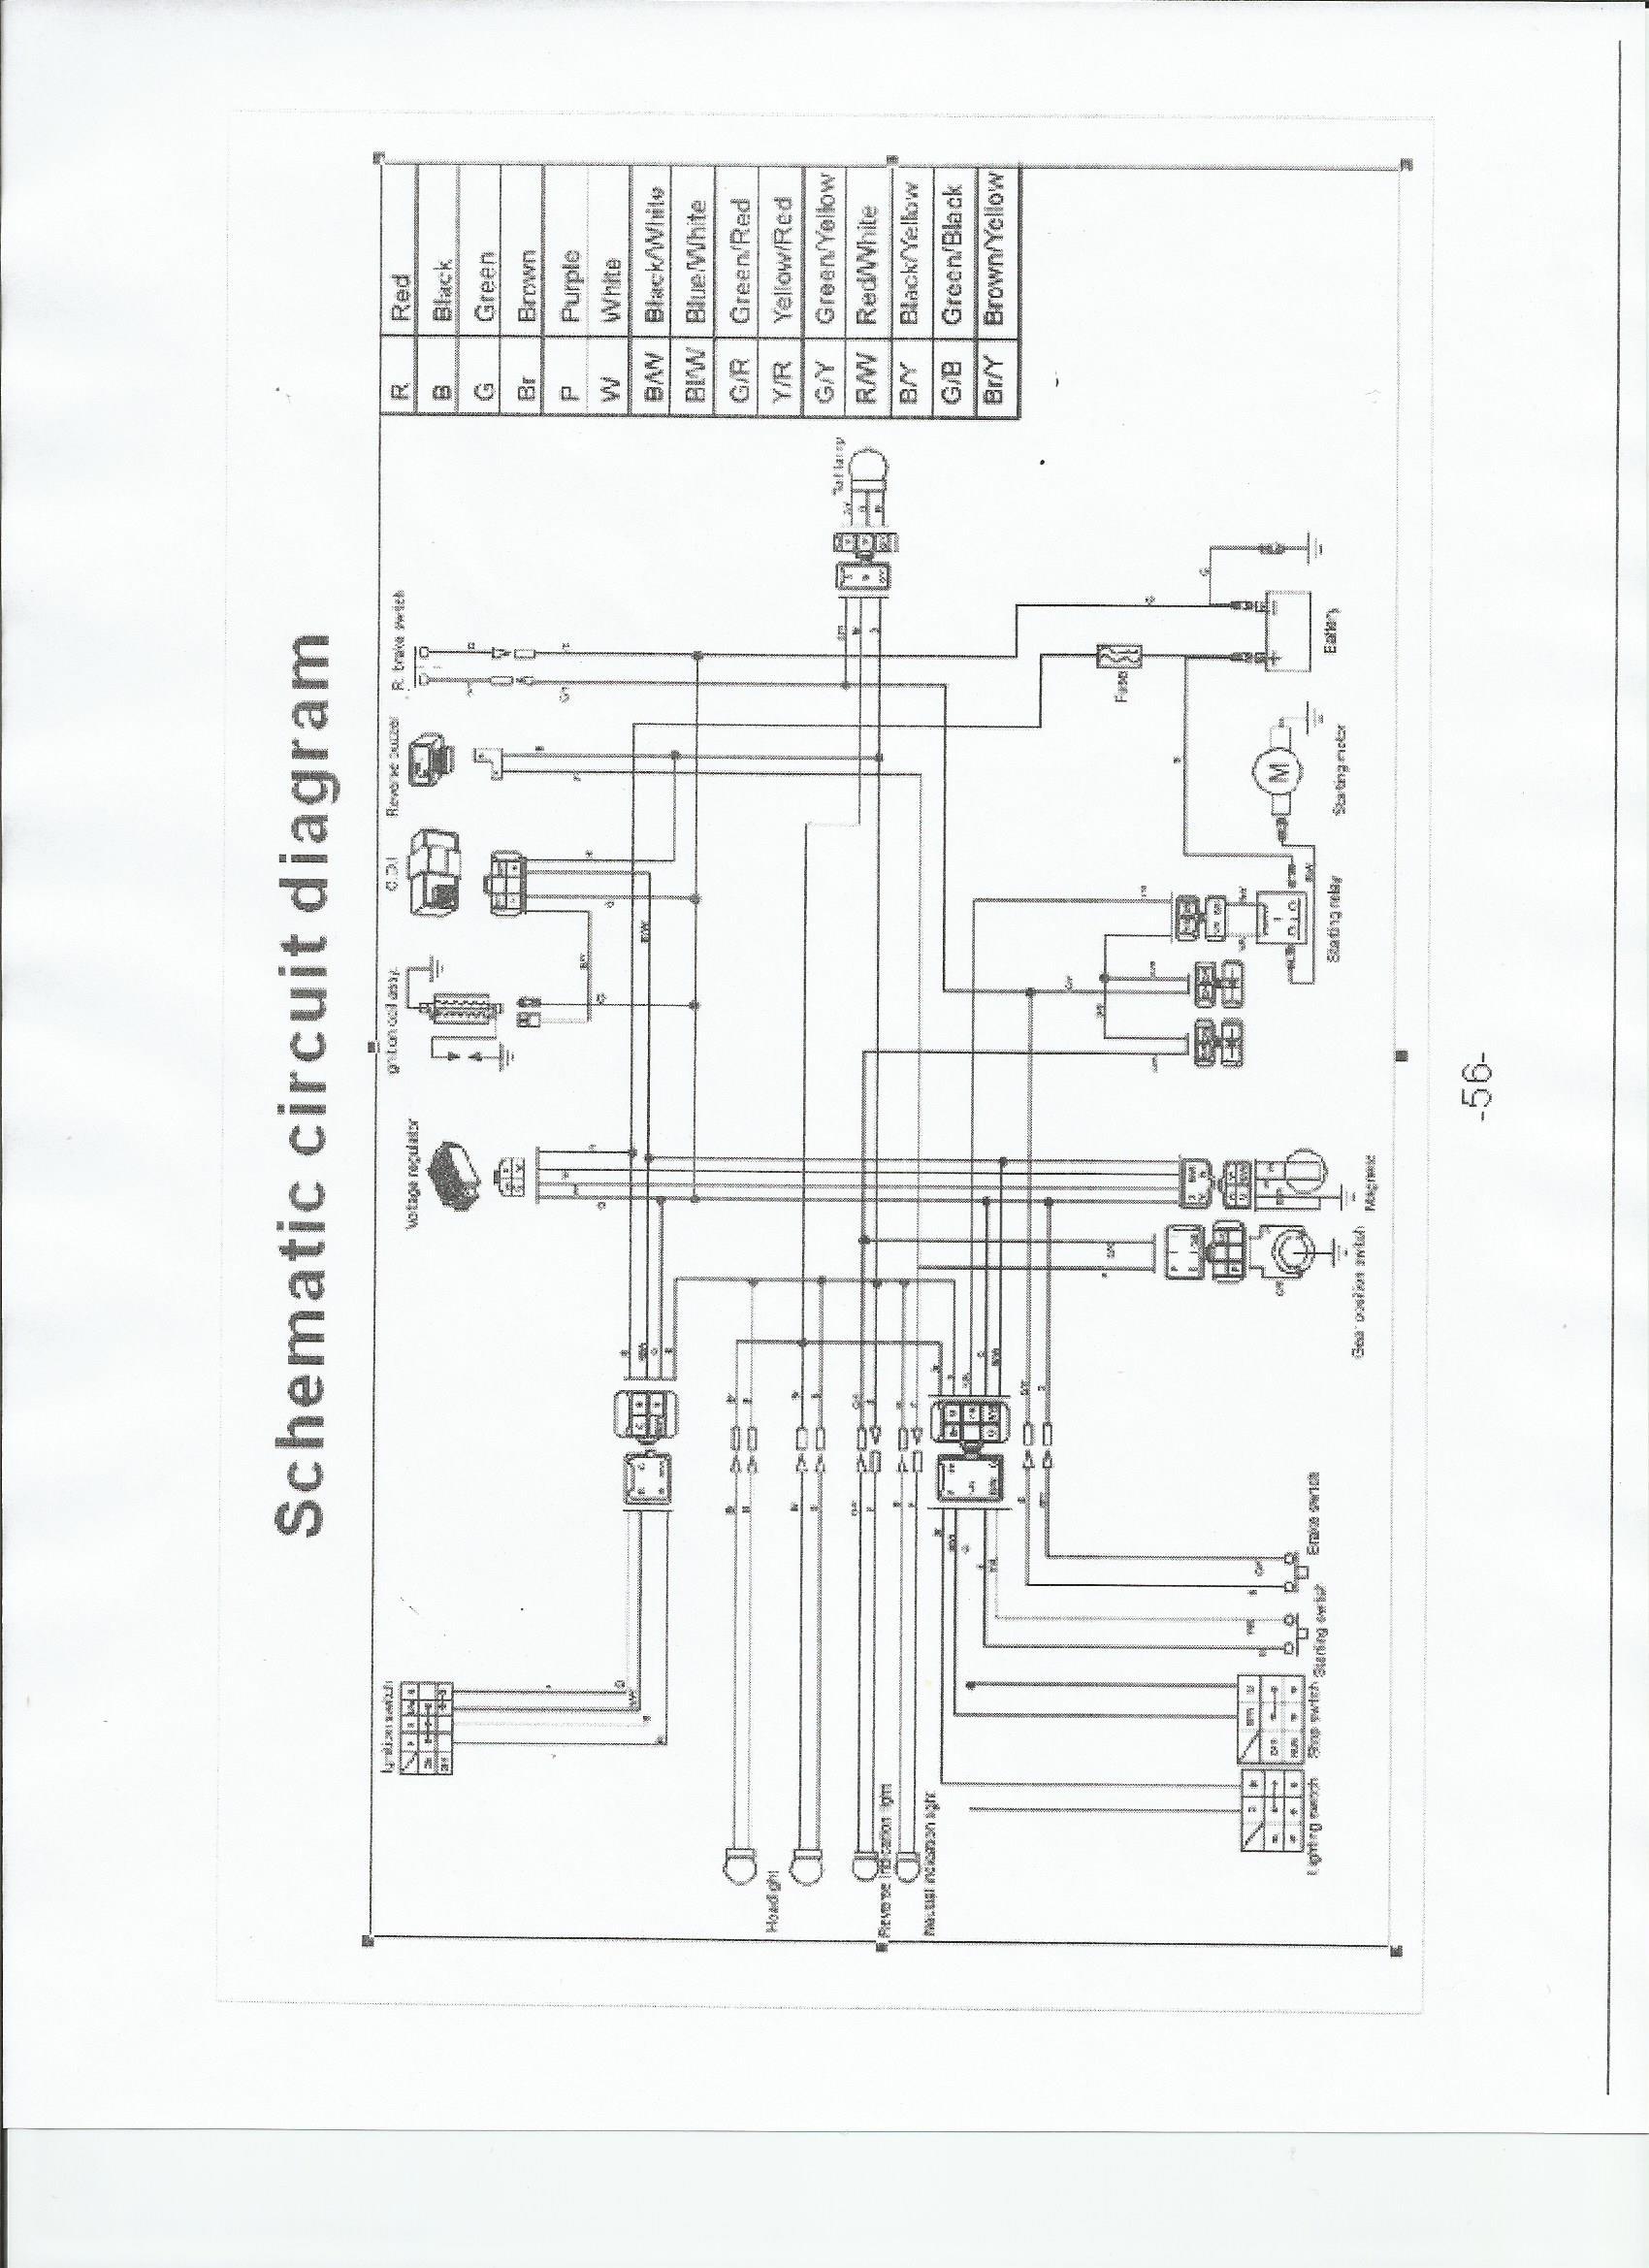 47F8B6 Toa Toa Atv 110 Wiring Diagram | Wiring LibraryWiring Library